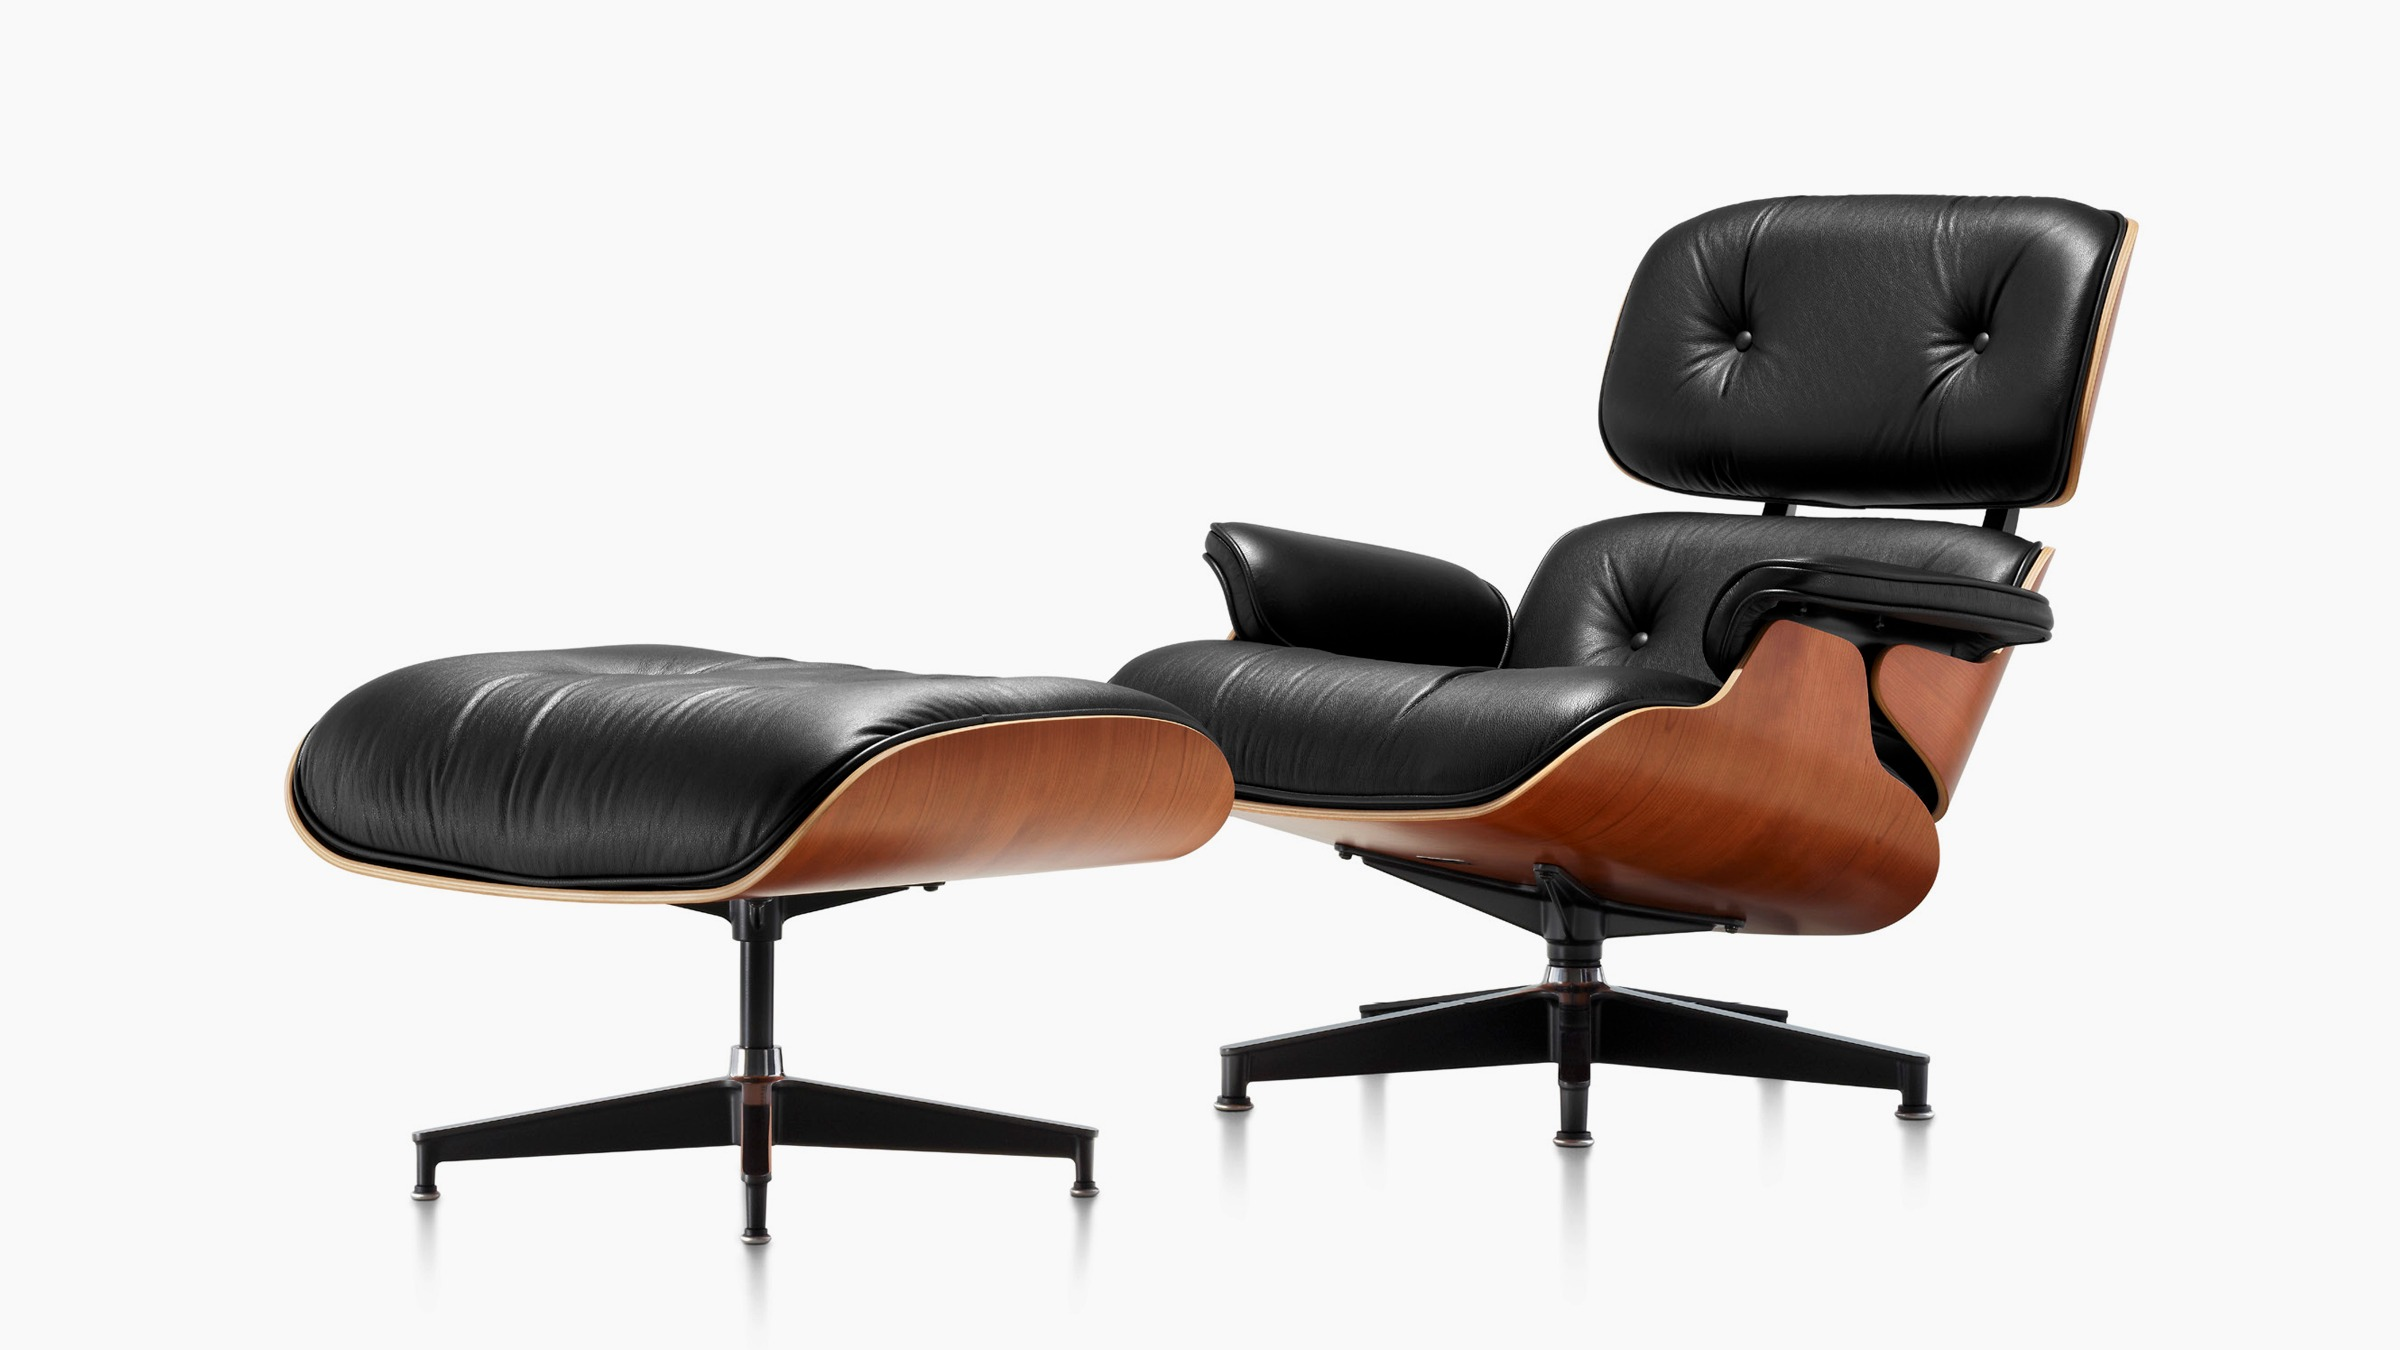 Bon Cheap Eames, Aeron, And Barcelona Chairs: Inside The Black ...